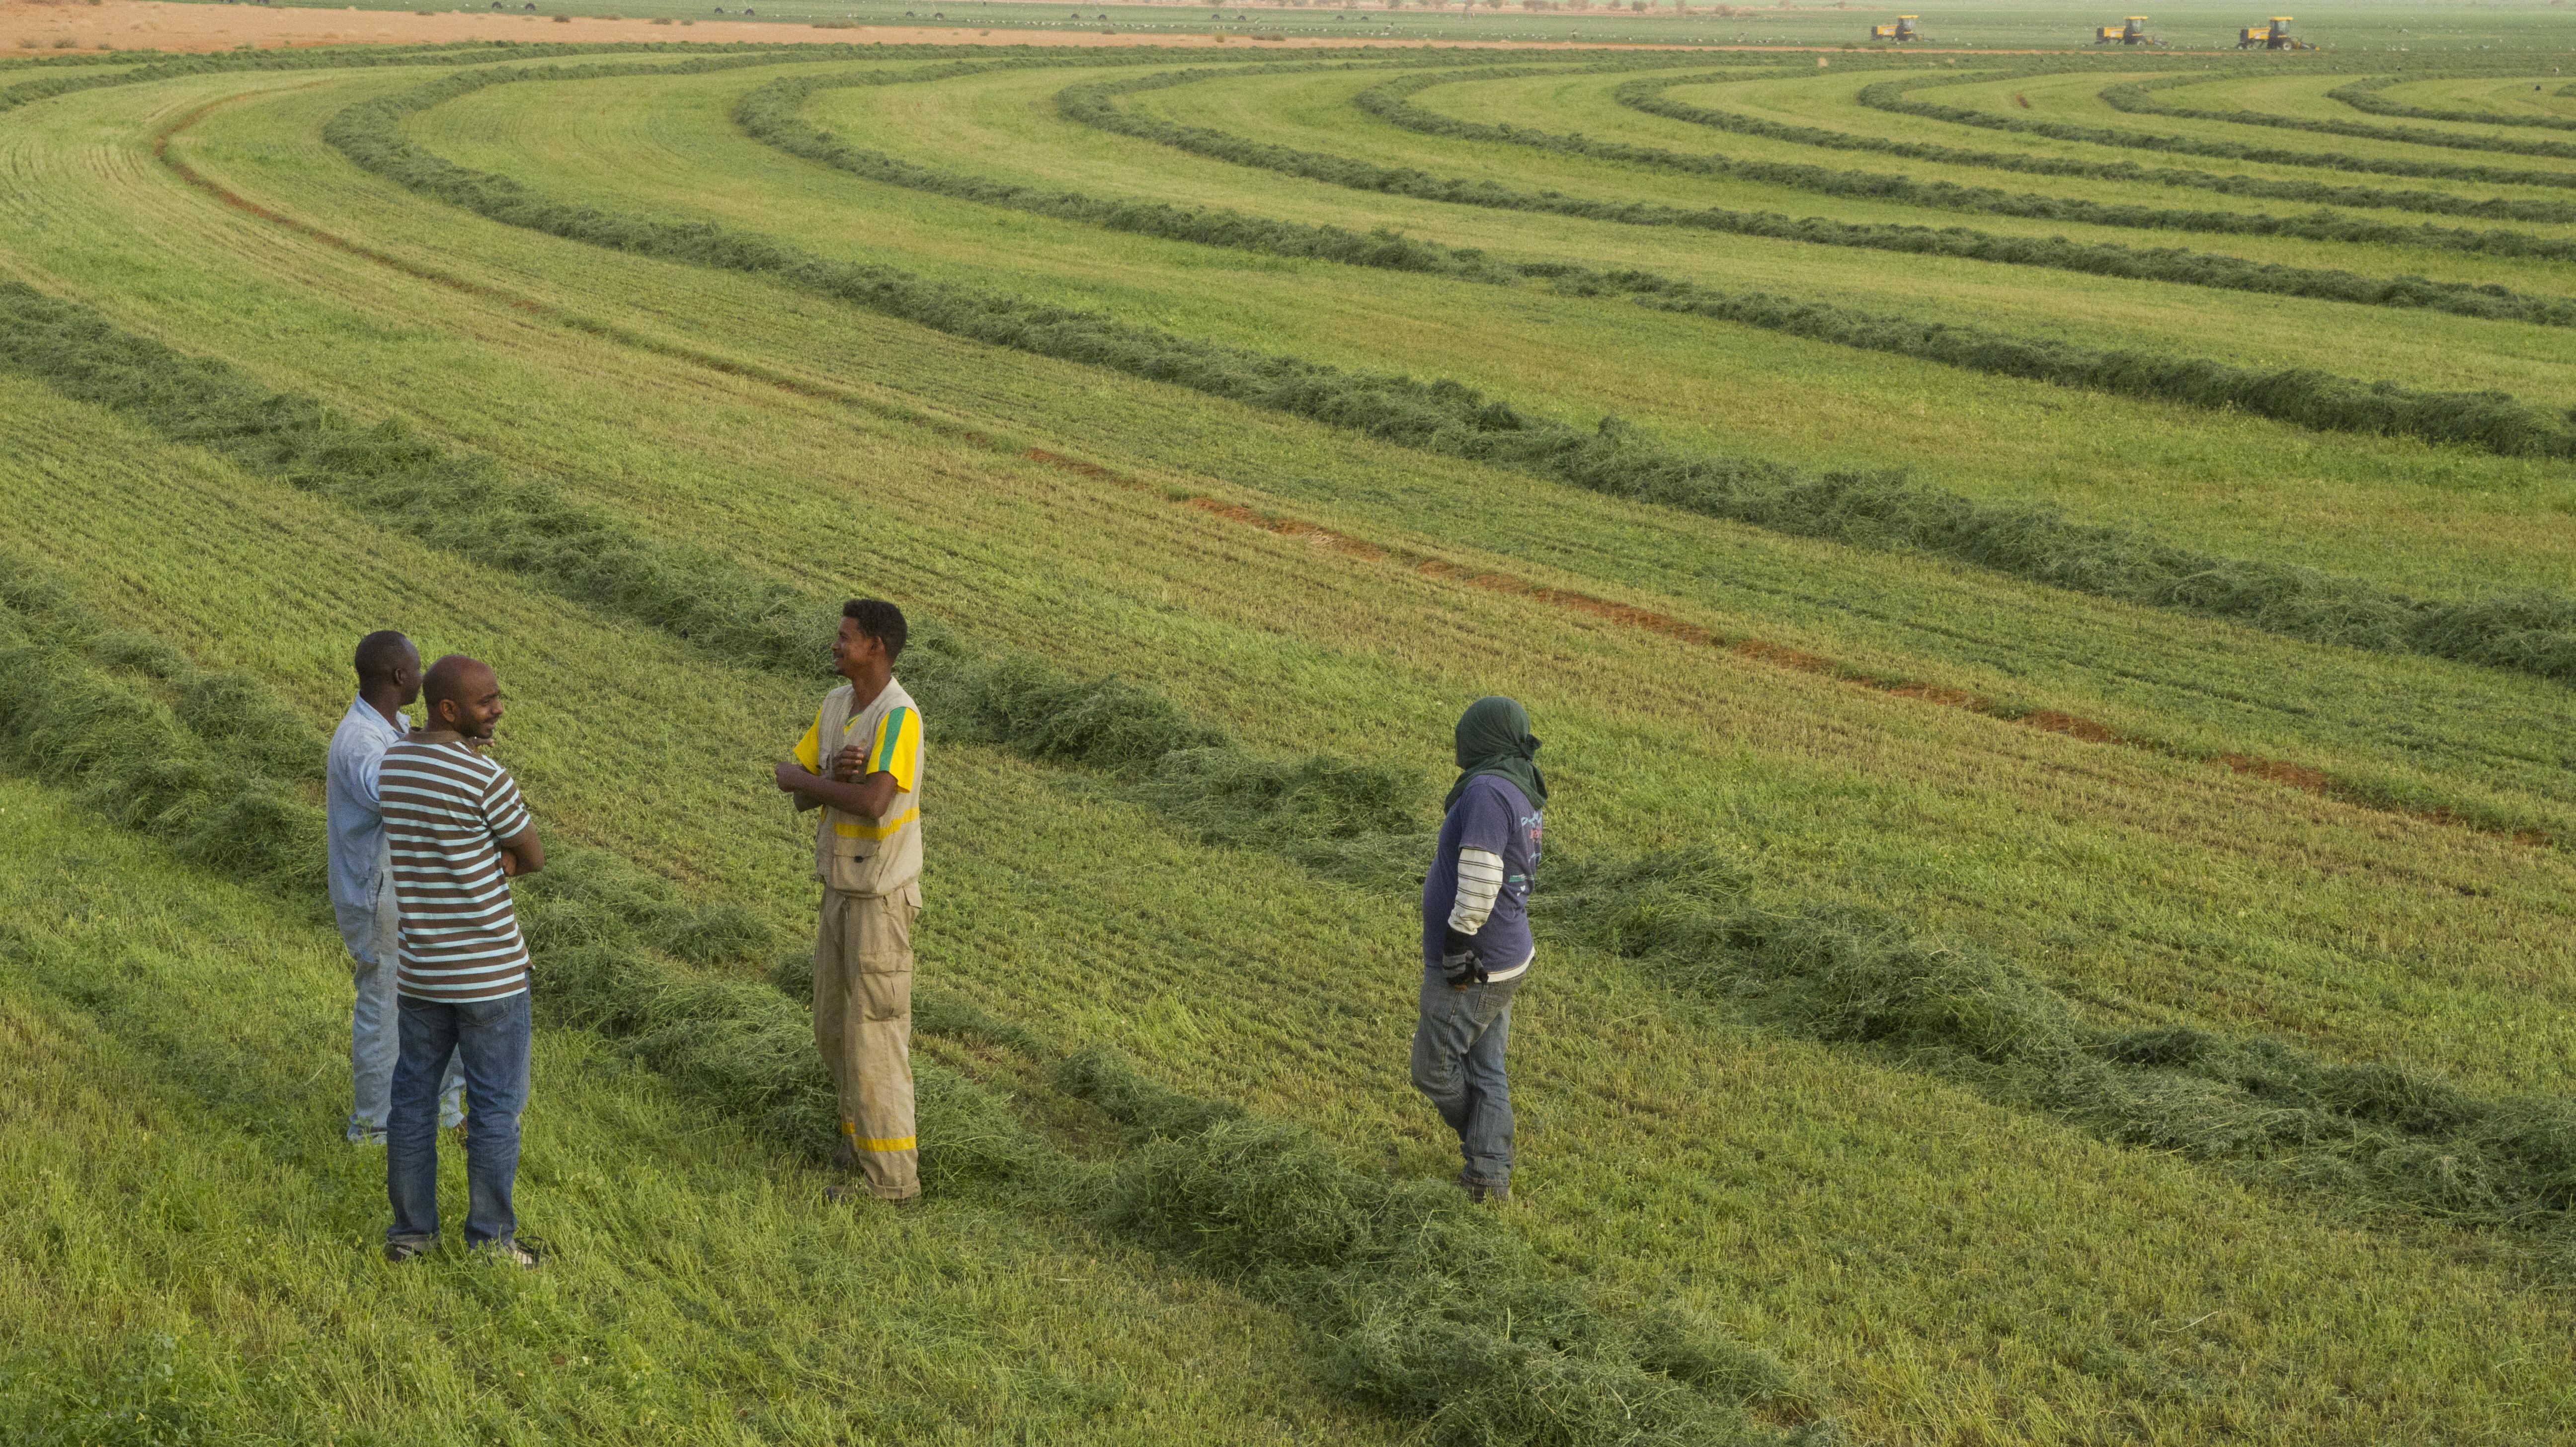 Ics Leading Partner For Farming Investors In Sudan